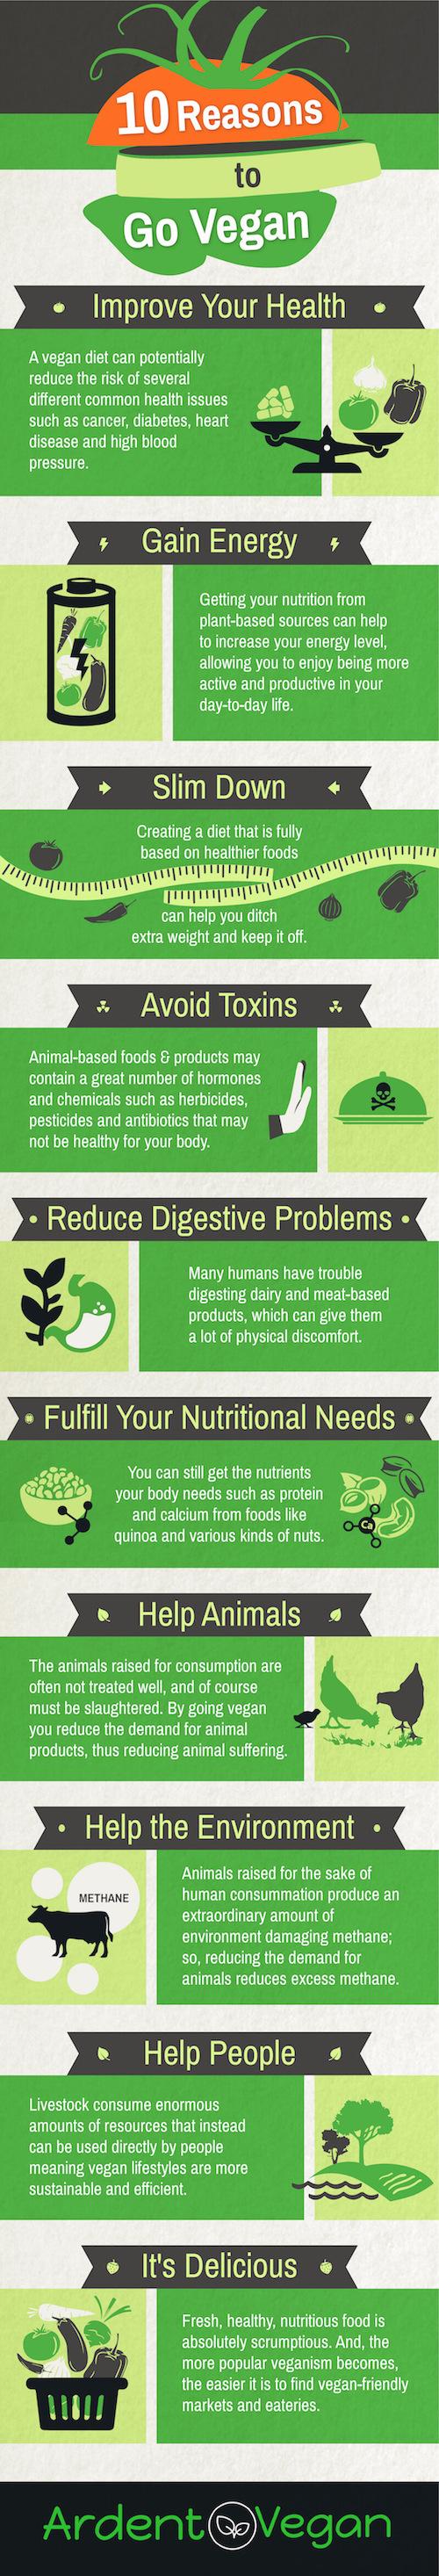 10 reasons to go vegan